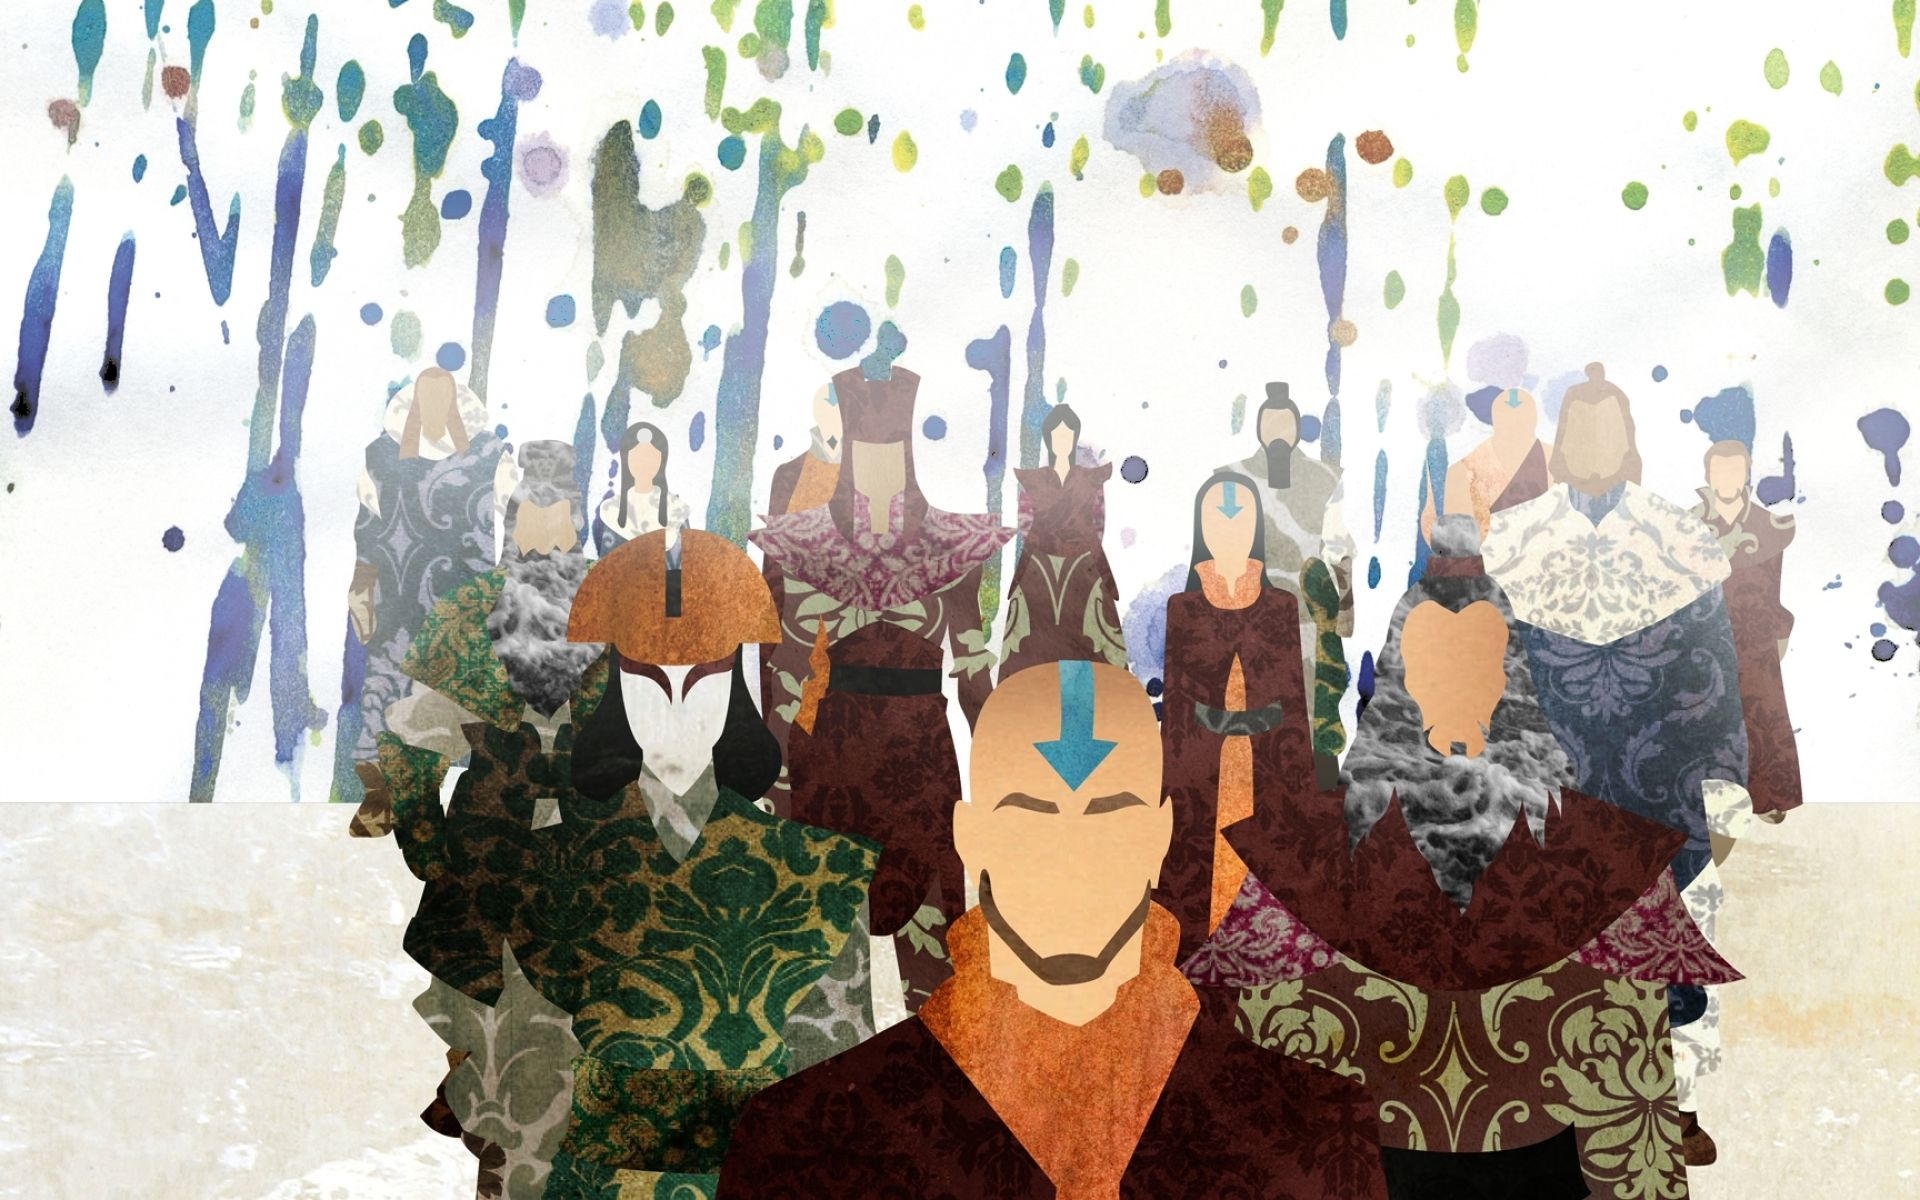 The Past Avatar - Wall Paper Art. | Avatar kyoshi, Avatar the last  airbender, Avatar